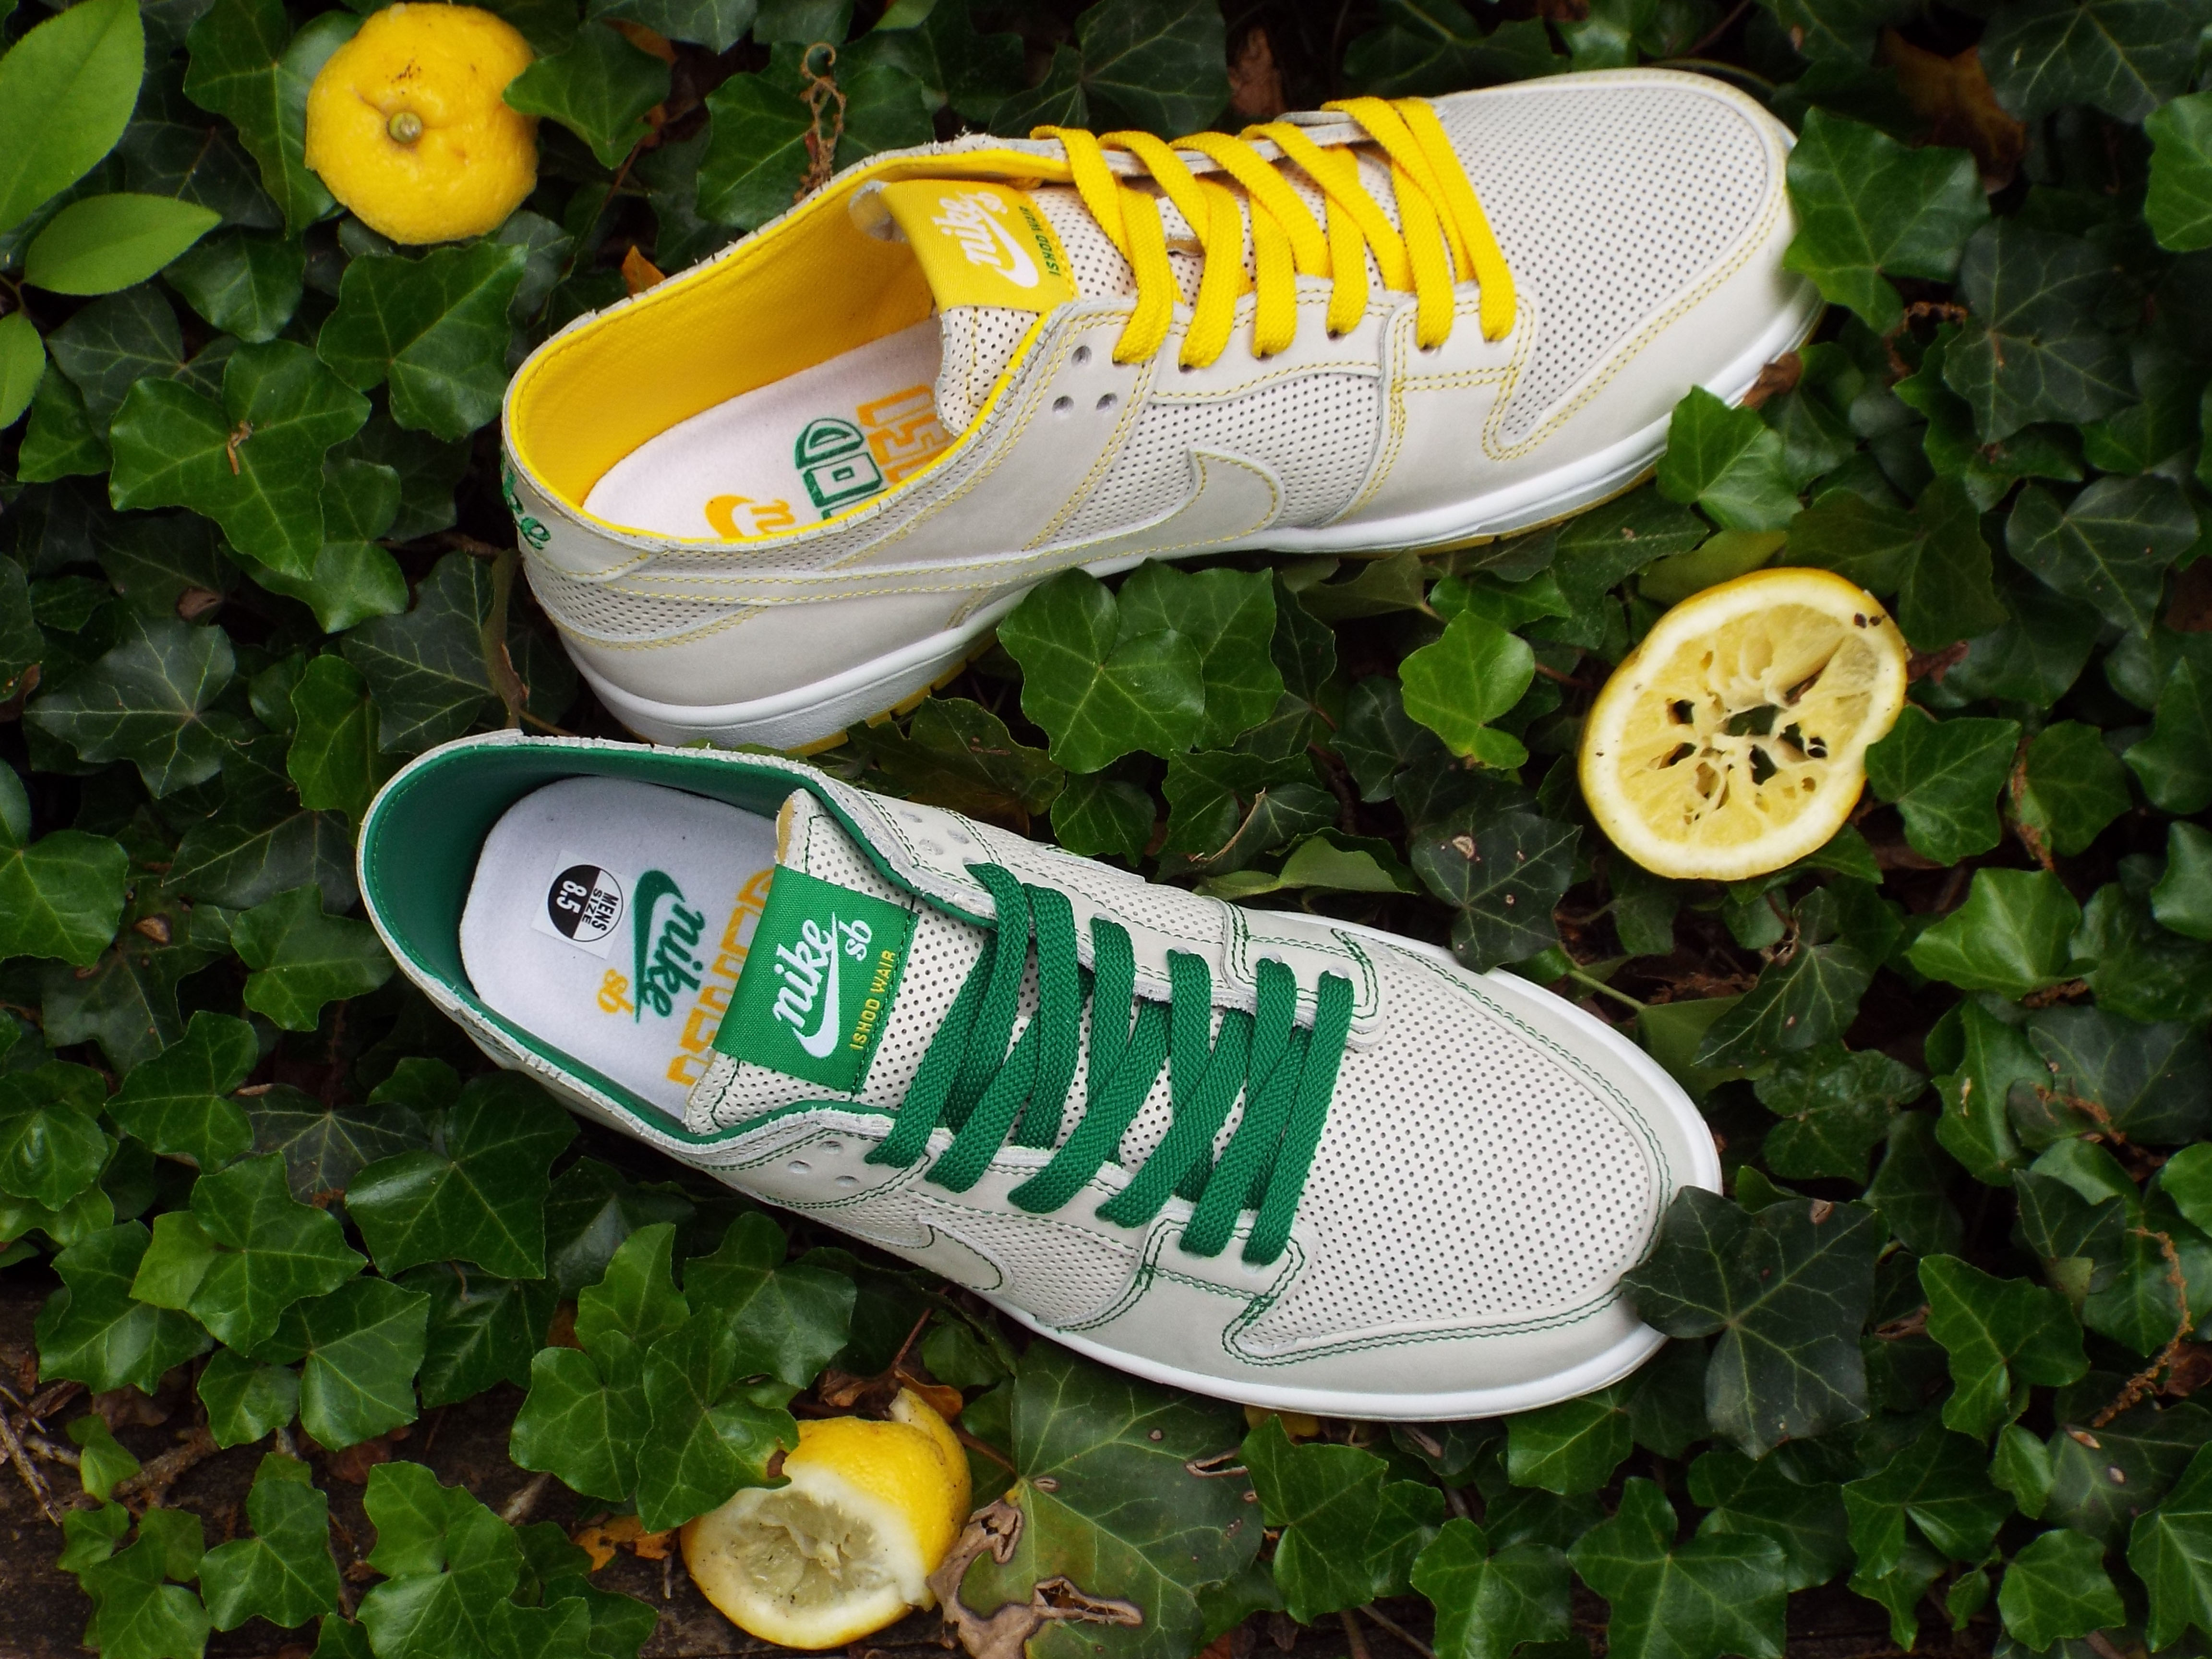 buy popular bb433 cda9b Nike SB Dunk Low Pro Deconstructed Ishod Wair Shoes in stock ...